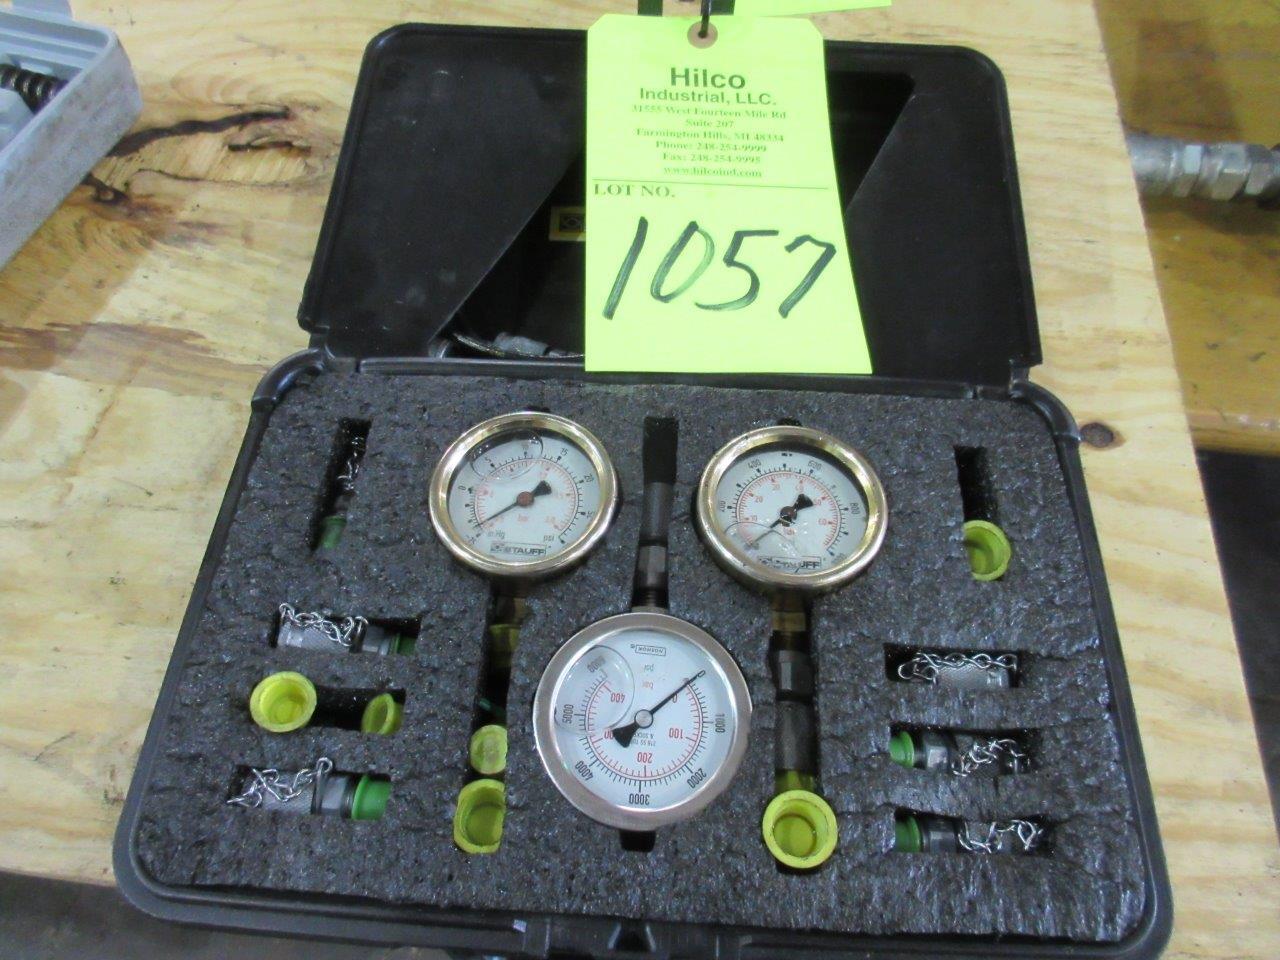 Lot 1057 - Stauff, Pressure Check Test Kit Hand Tools